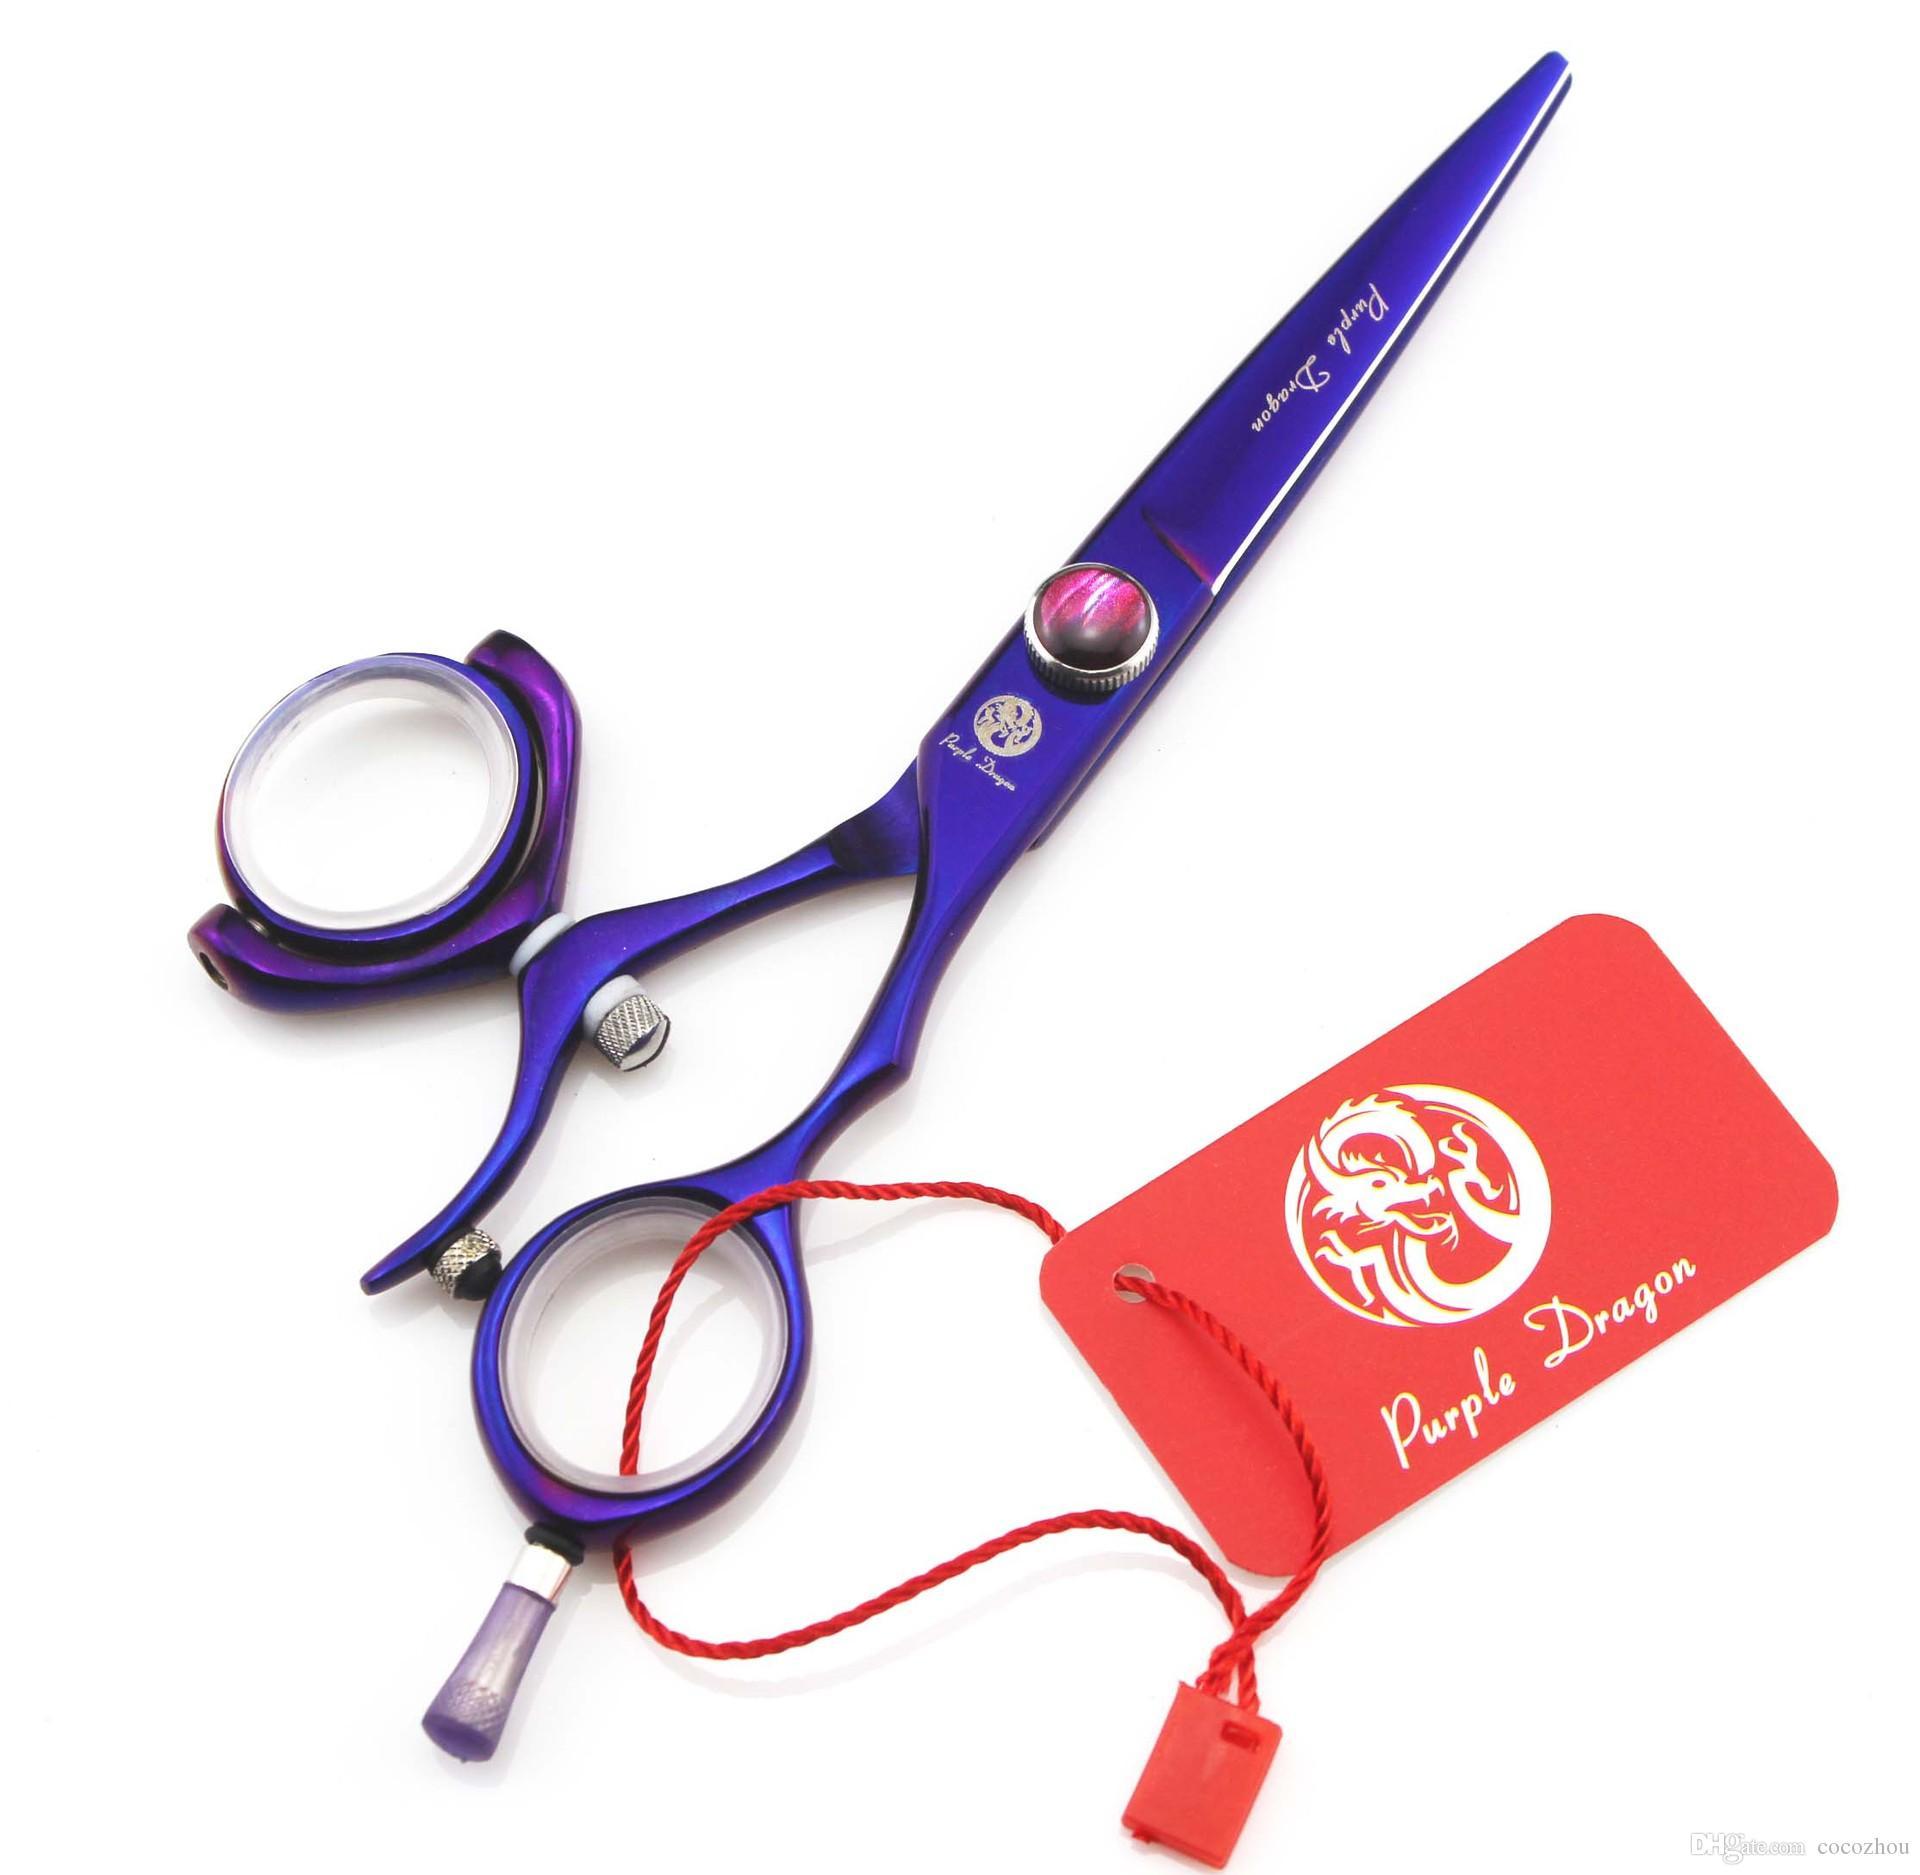 610# 5.5'' Brand Purple Dragon TOP GRADE Hairdressing Scissors JP 440C 360 Degree Rotation Barbers Cutting Shears Hair Scissors